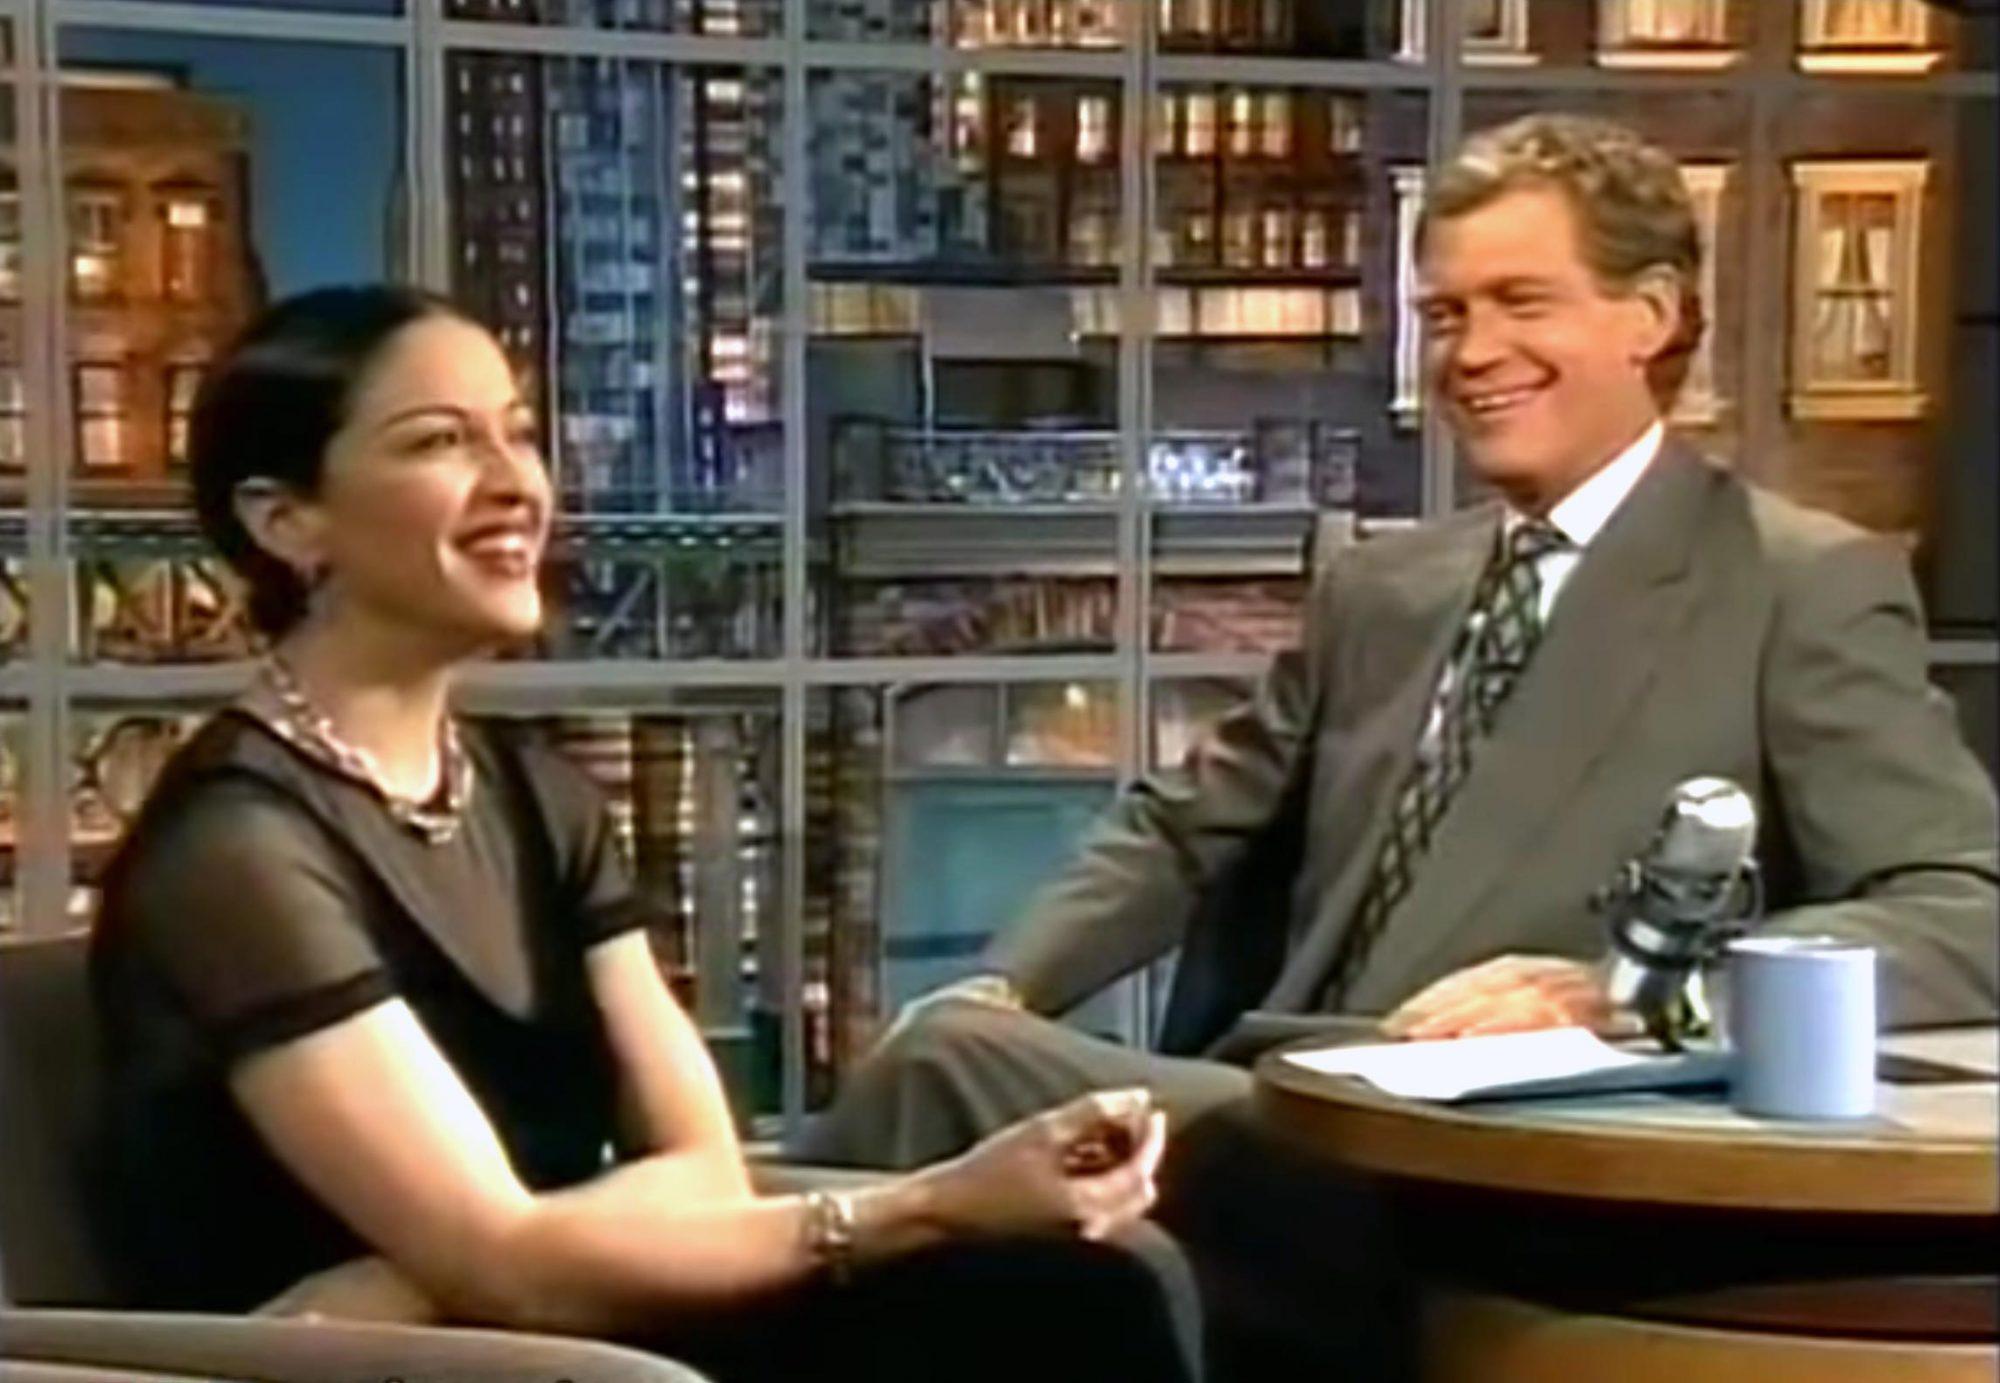 Madonna on Letterman 1994 (screen grab)